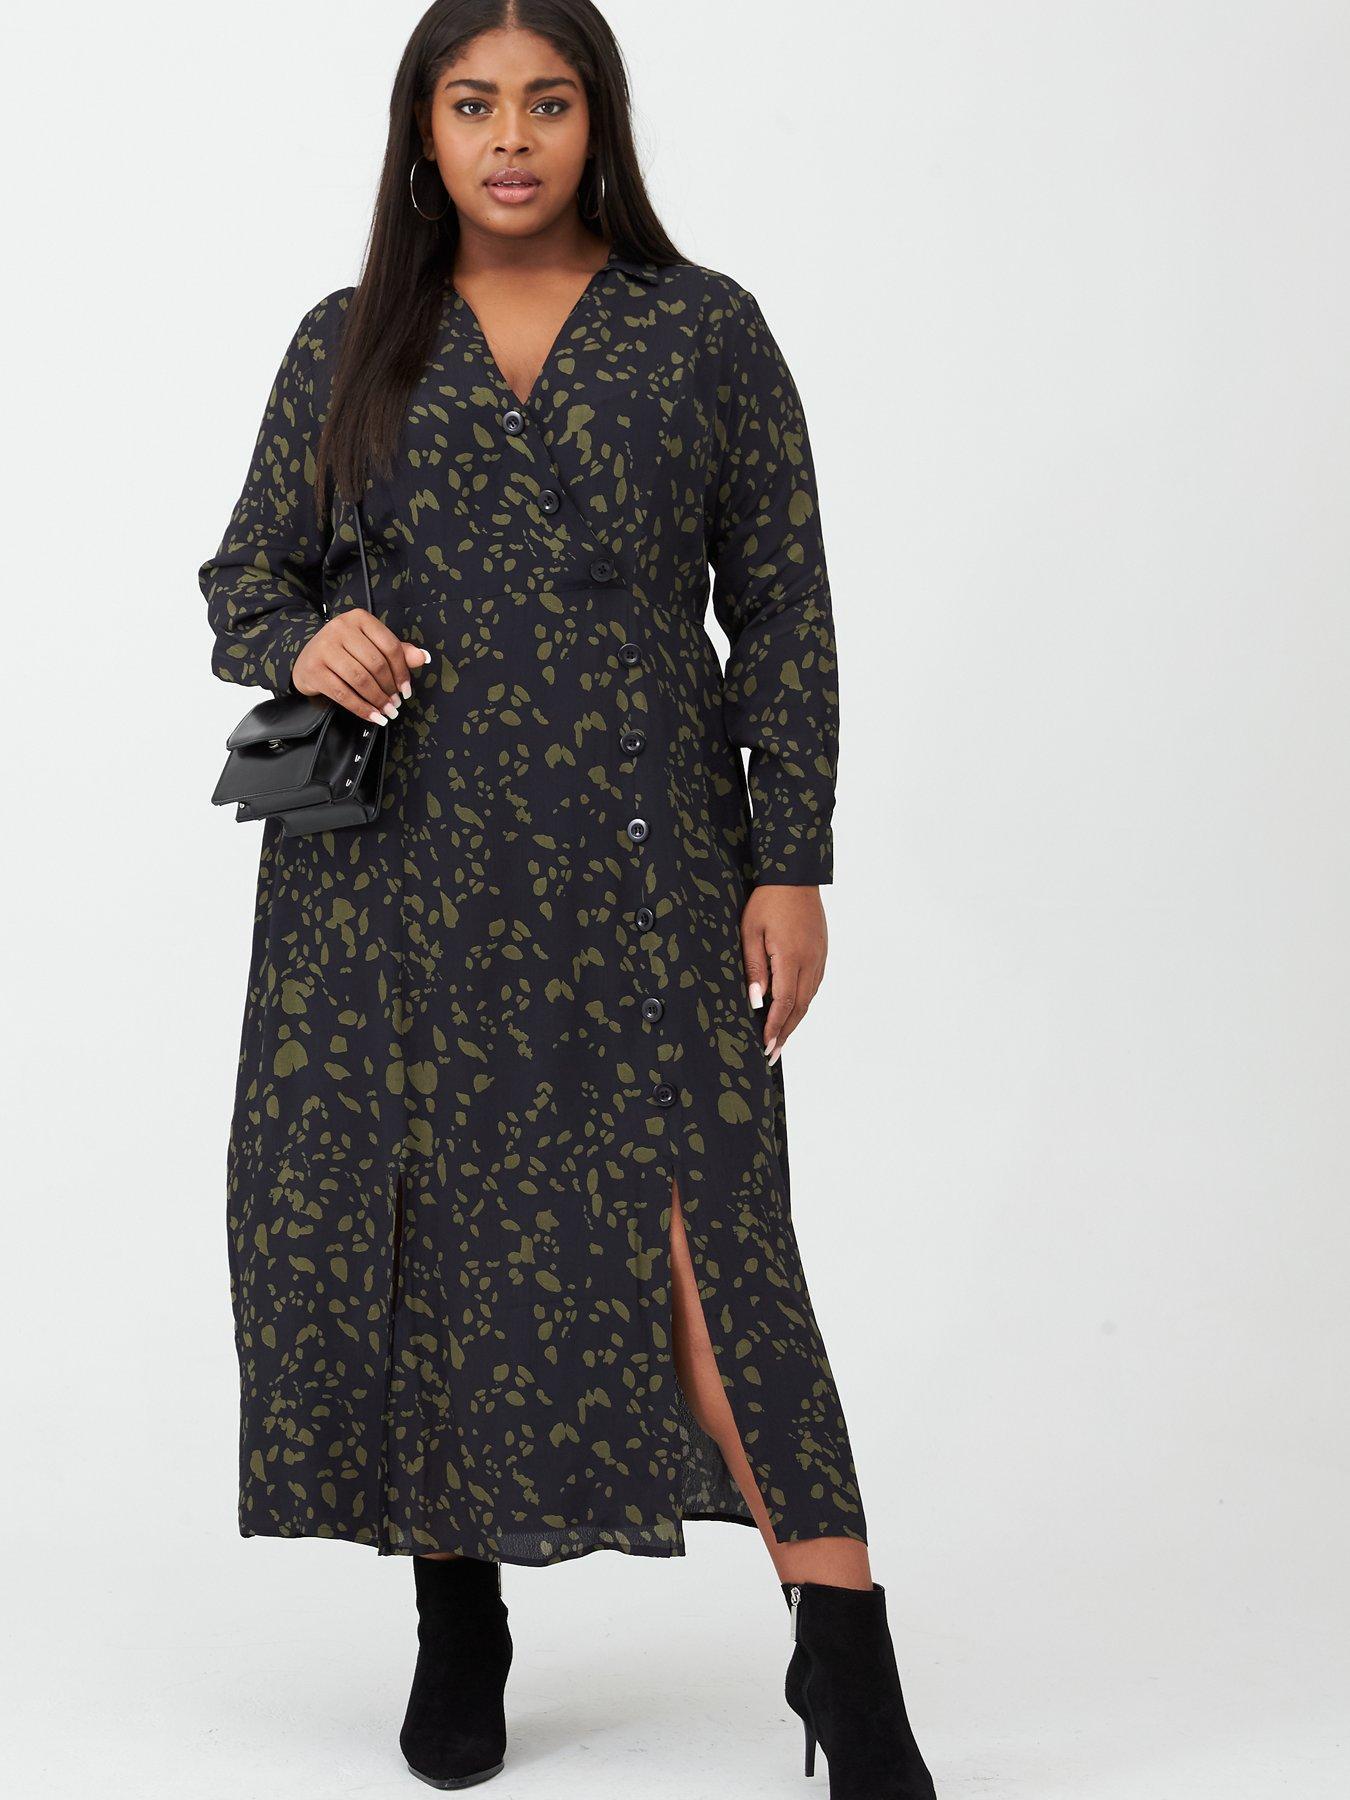 Design-1618V-M Abstract Print Viscose Dress Fabric